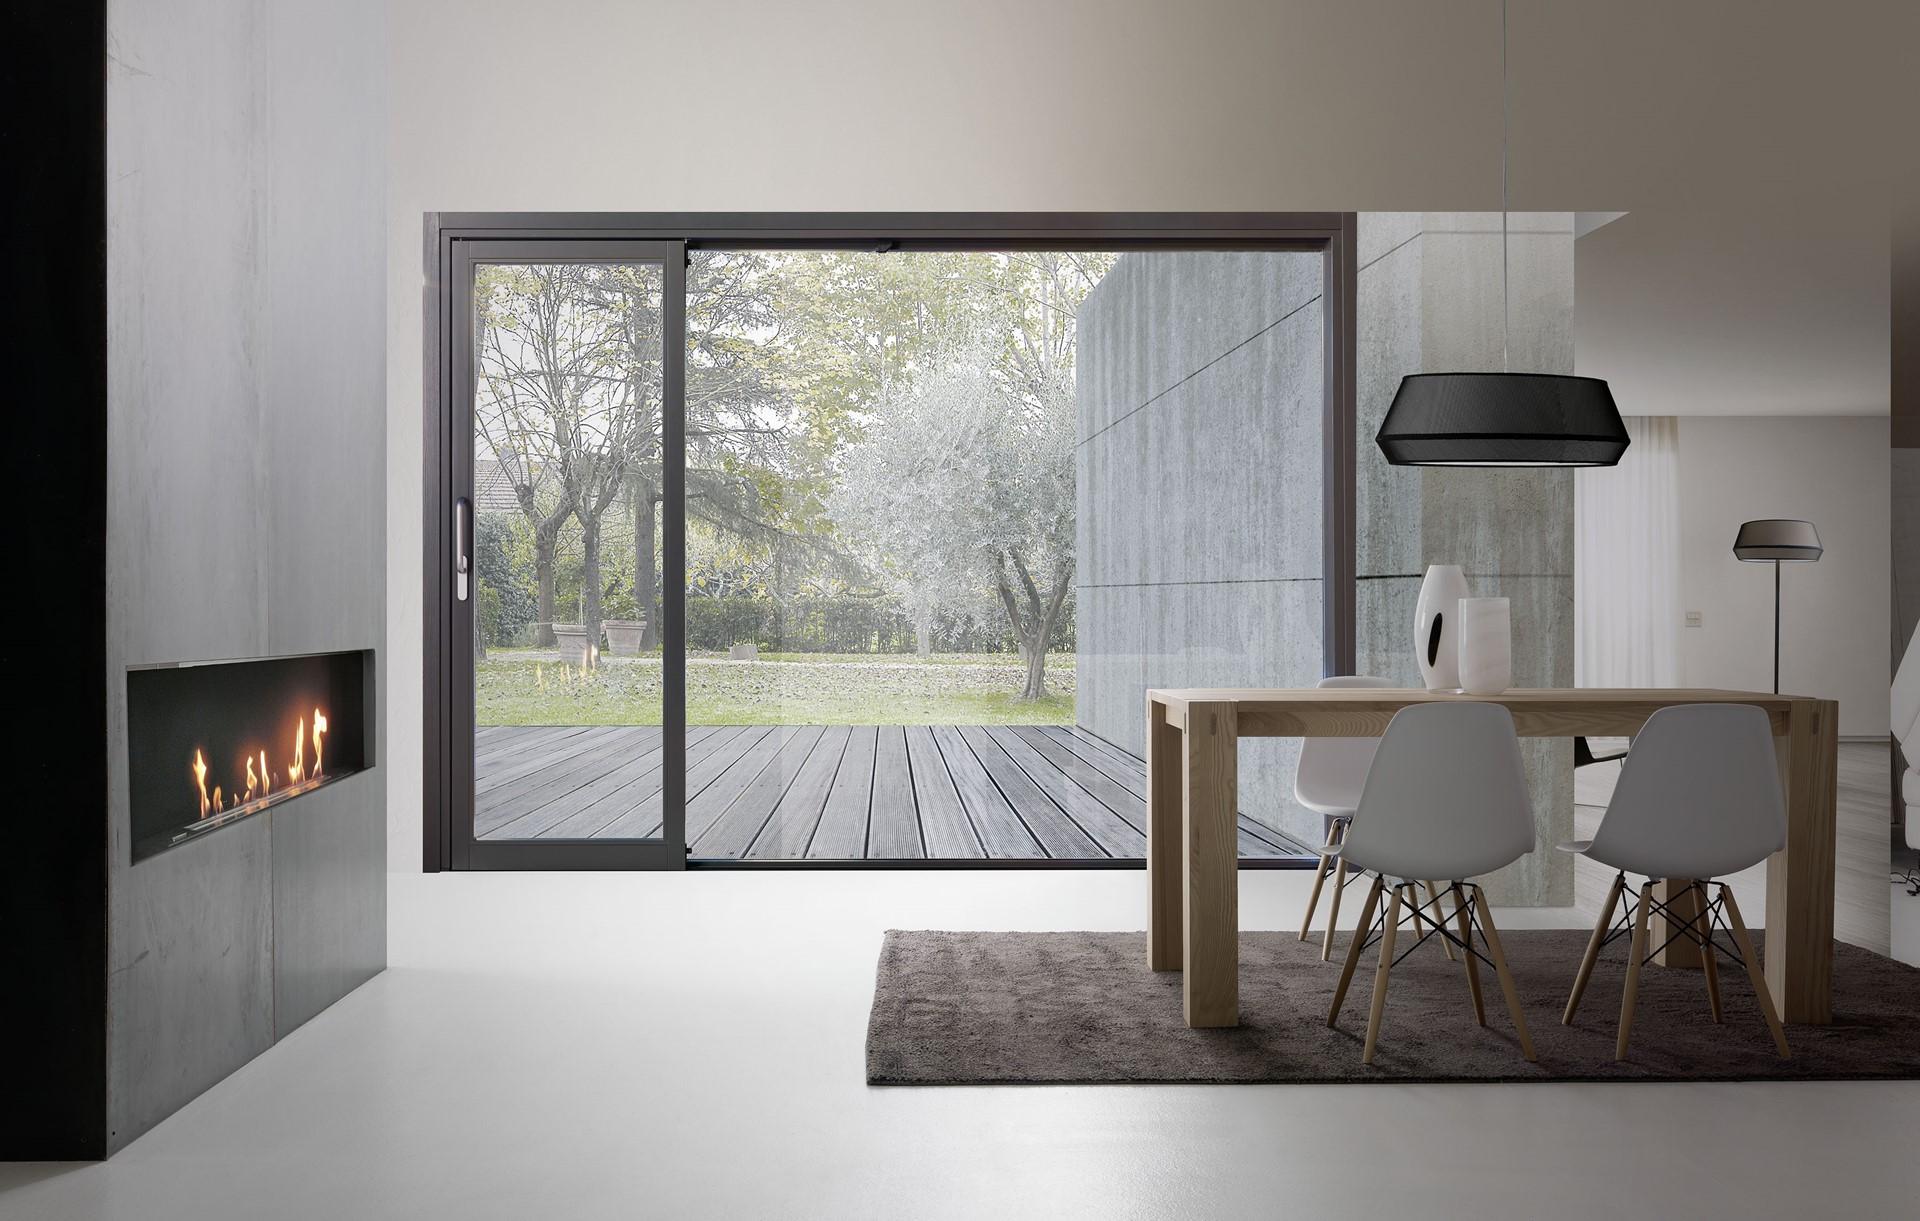 castilglieri-porte-finestre-3